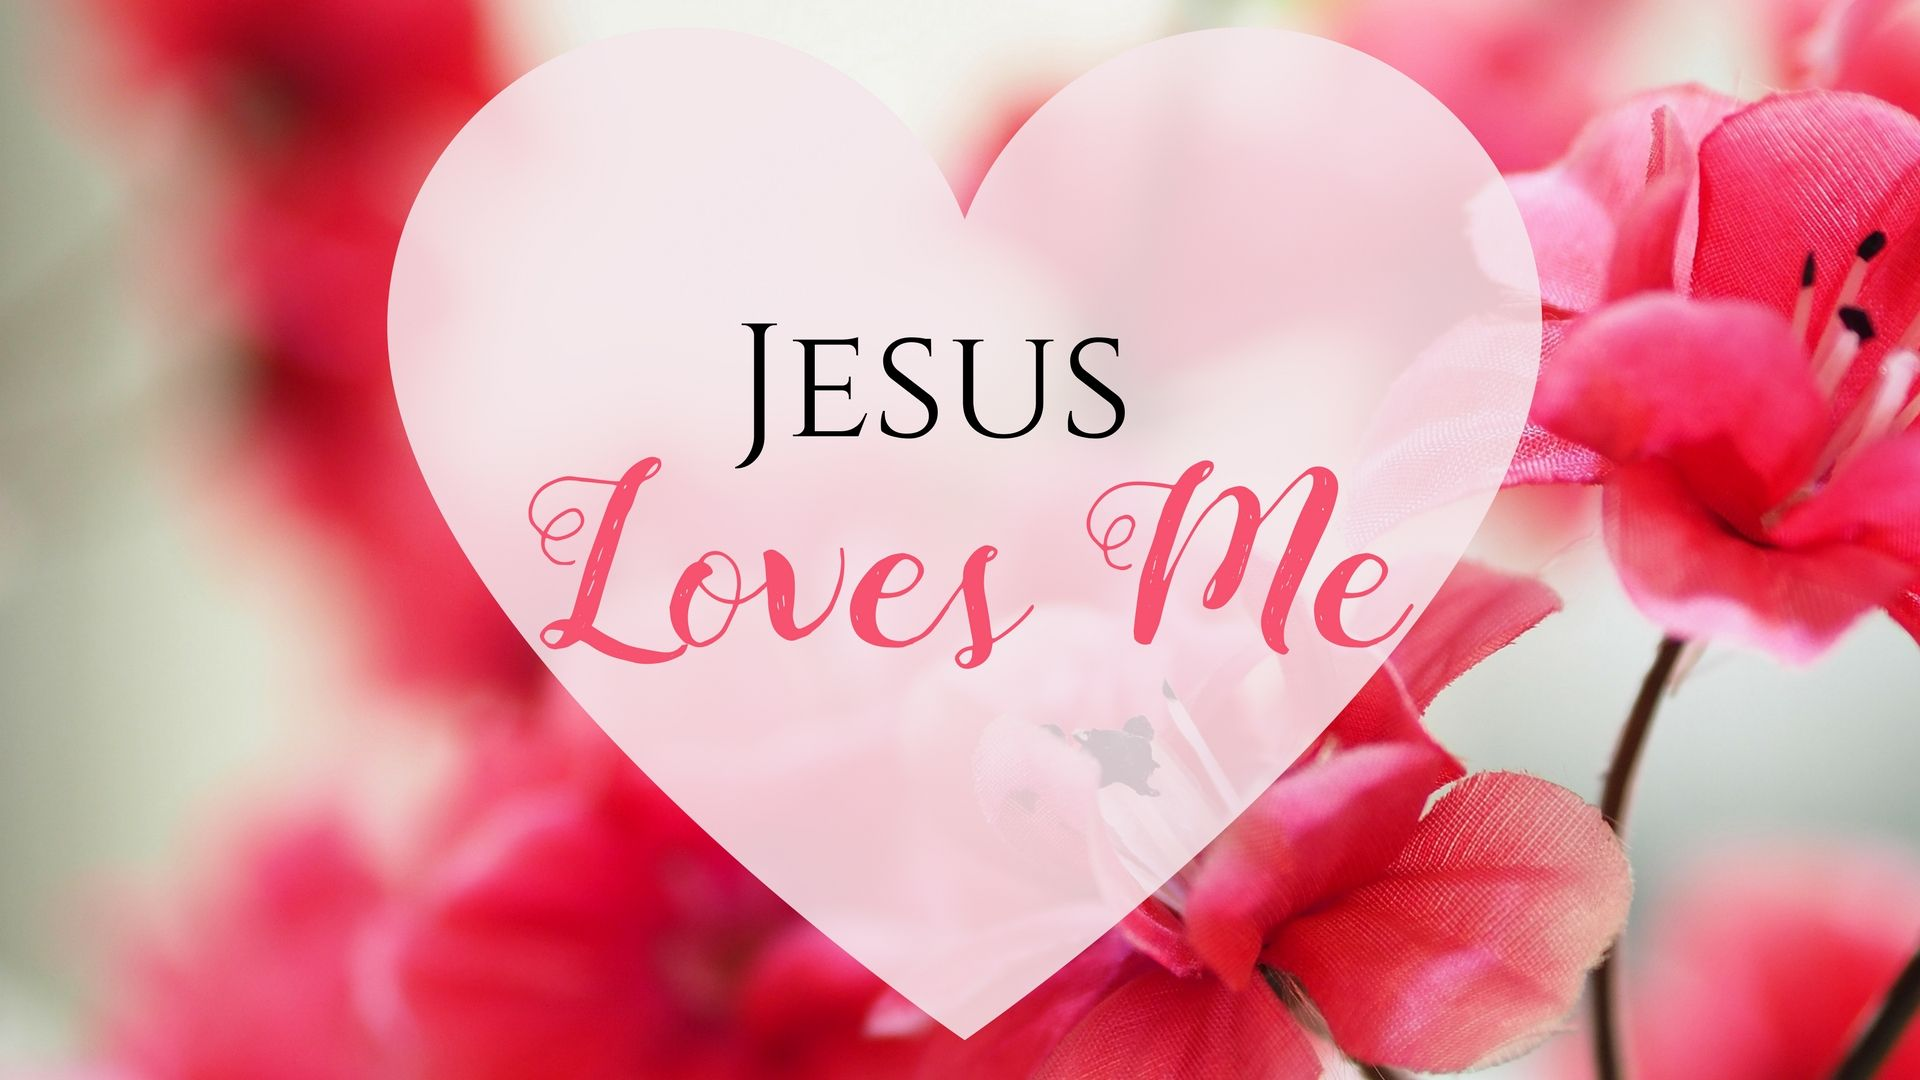 Ahavah Valentines Scripture Free Christian Wallpaper Christian Wallpaper